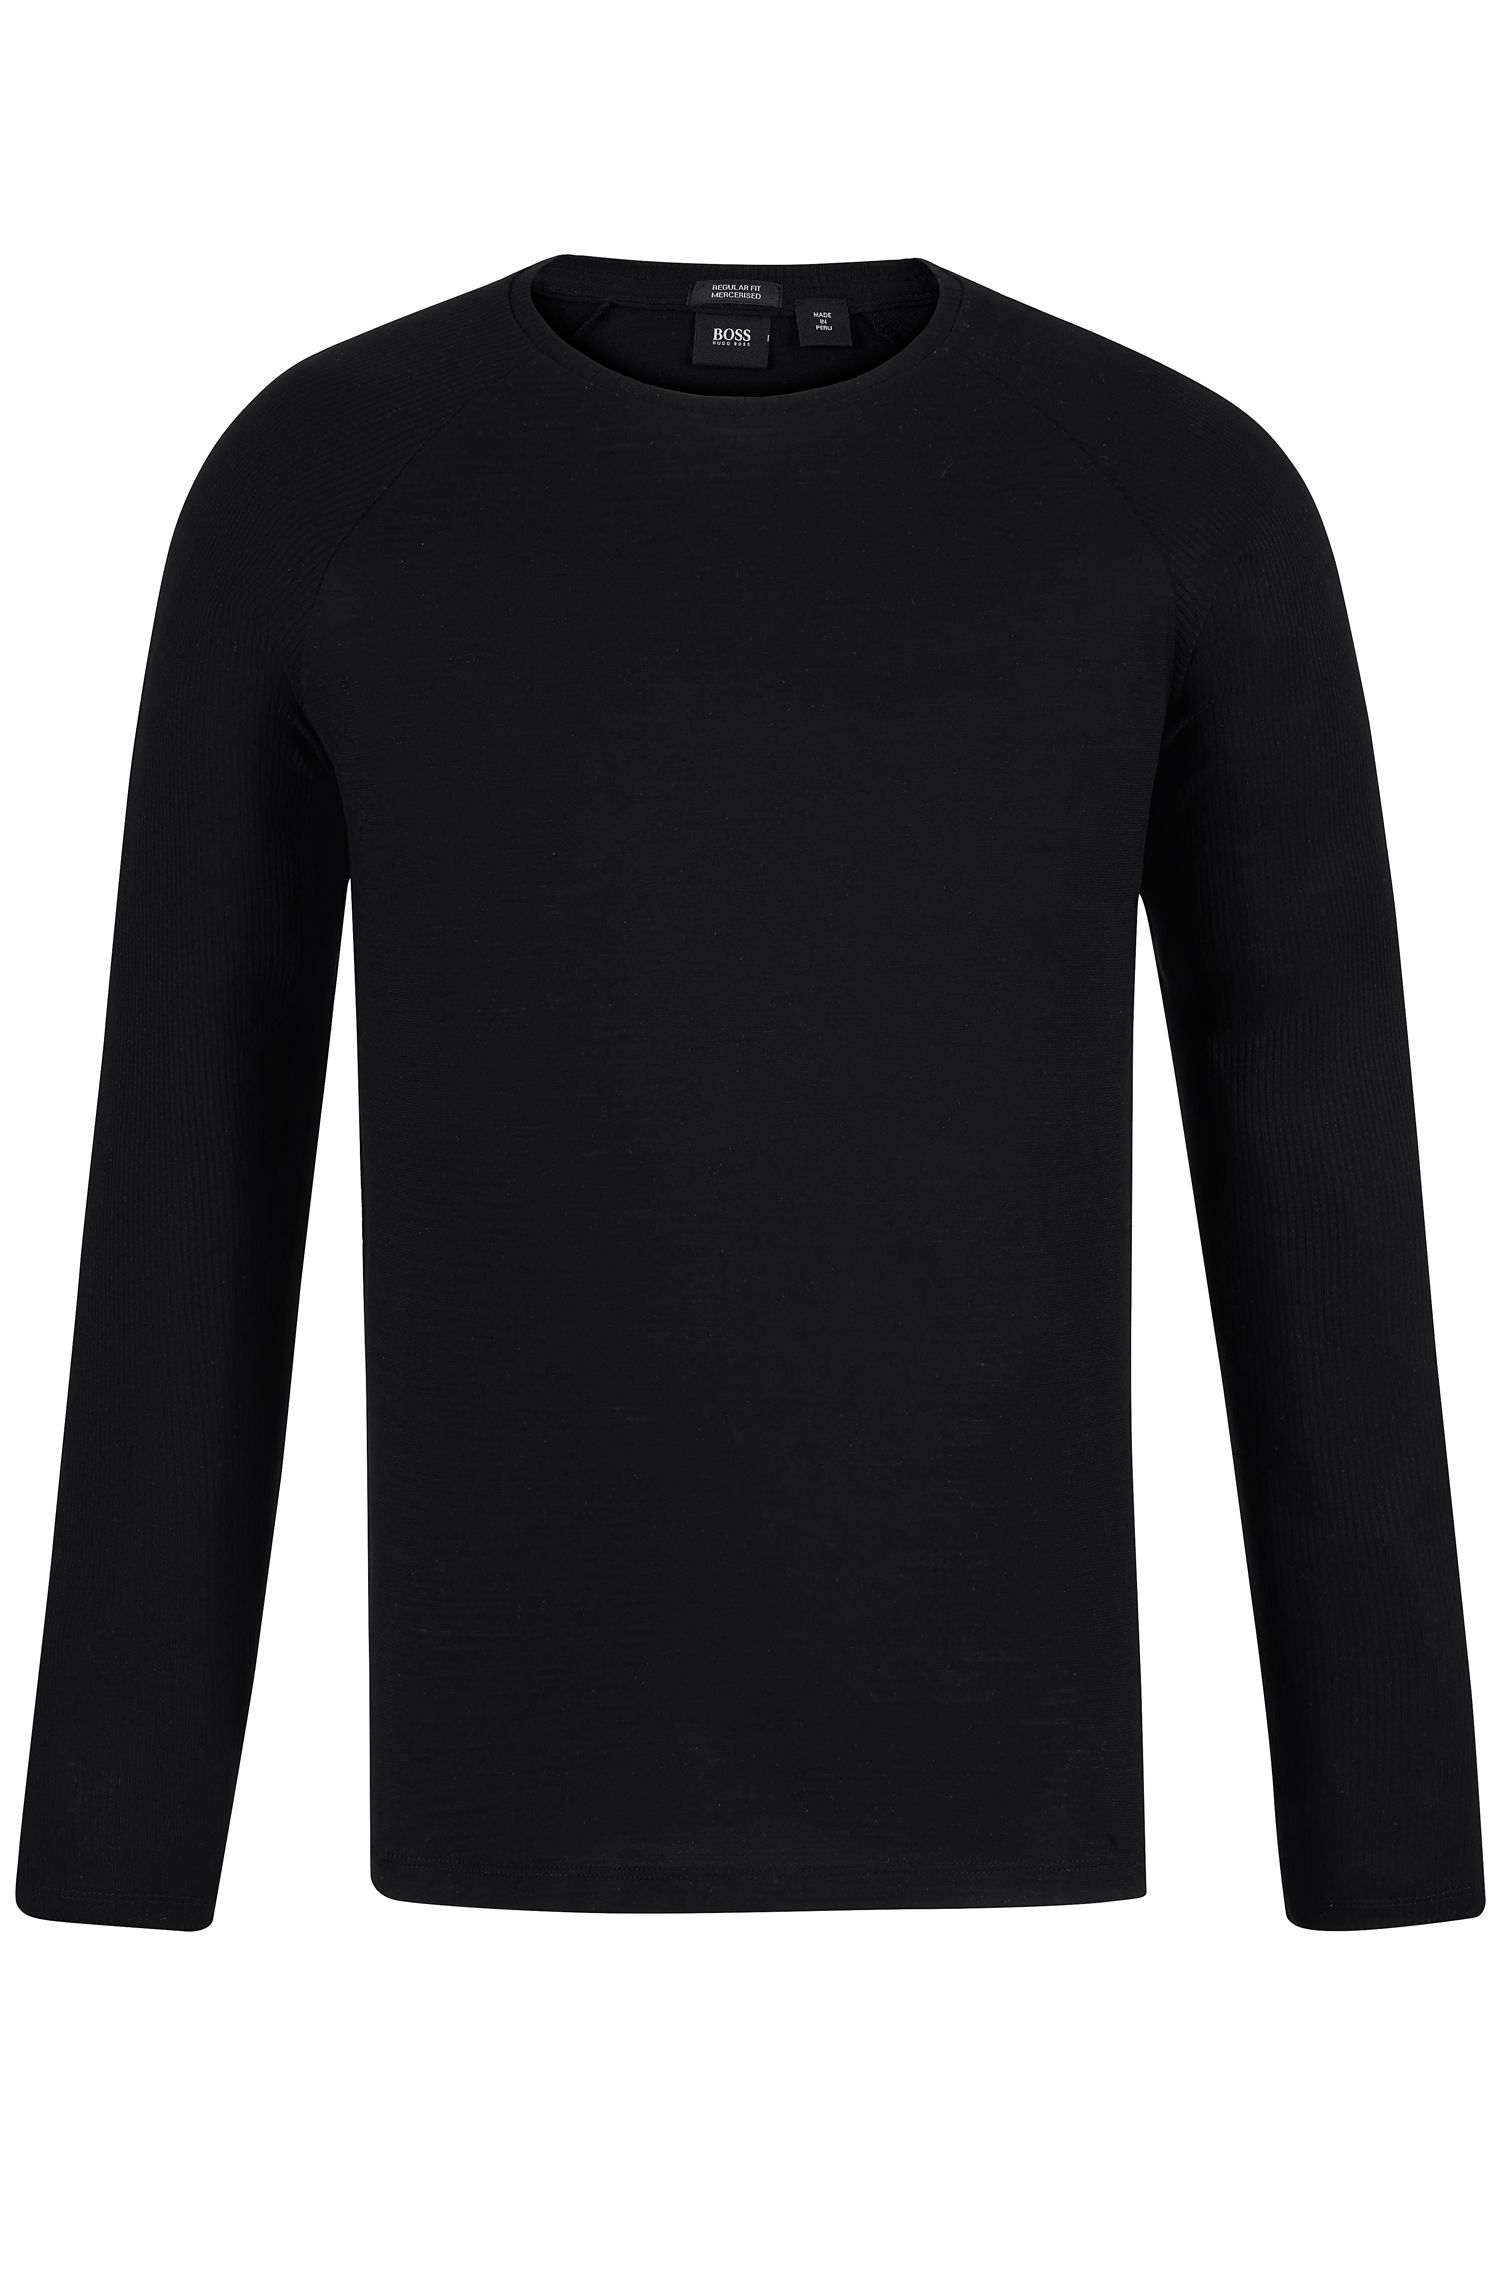 Cotton Long-Sleeved T-Shirt   Terell